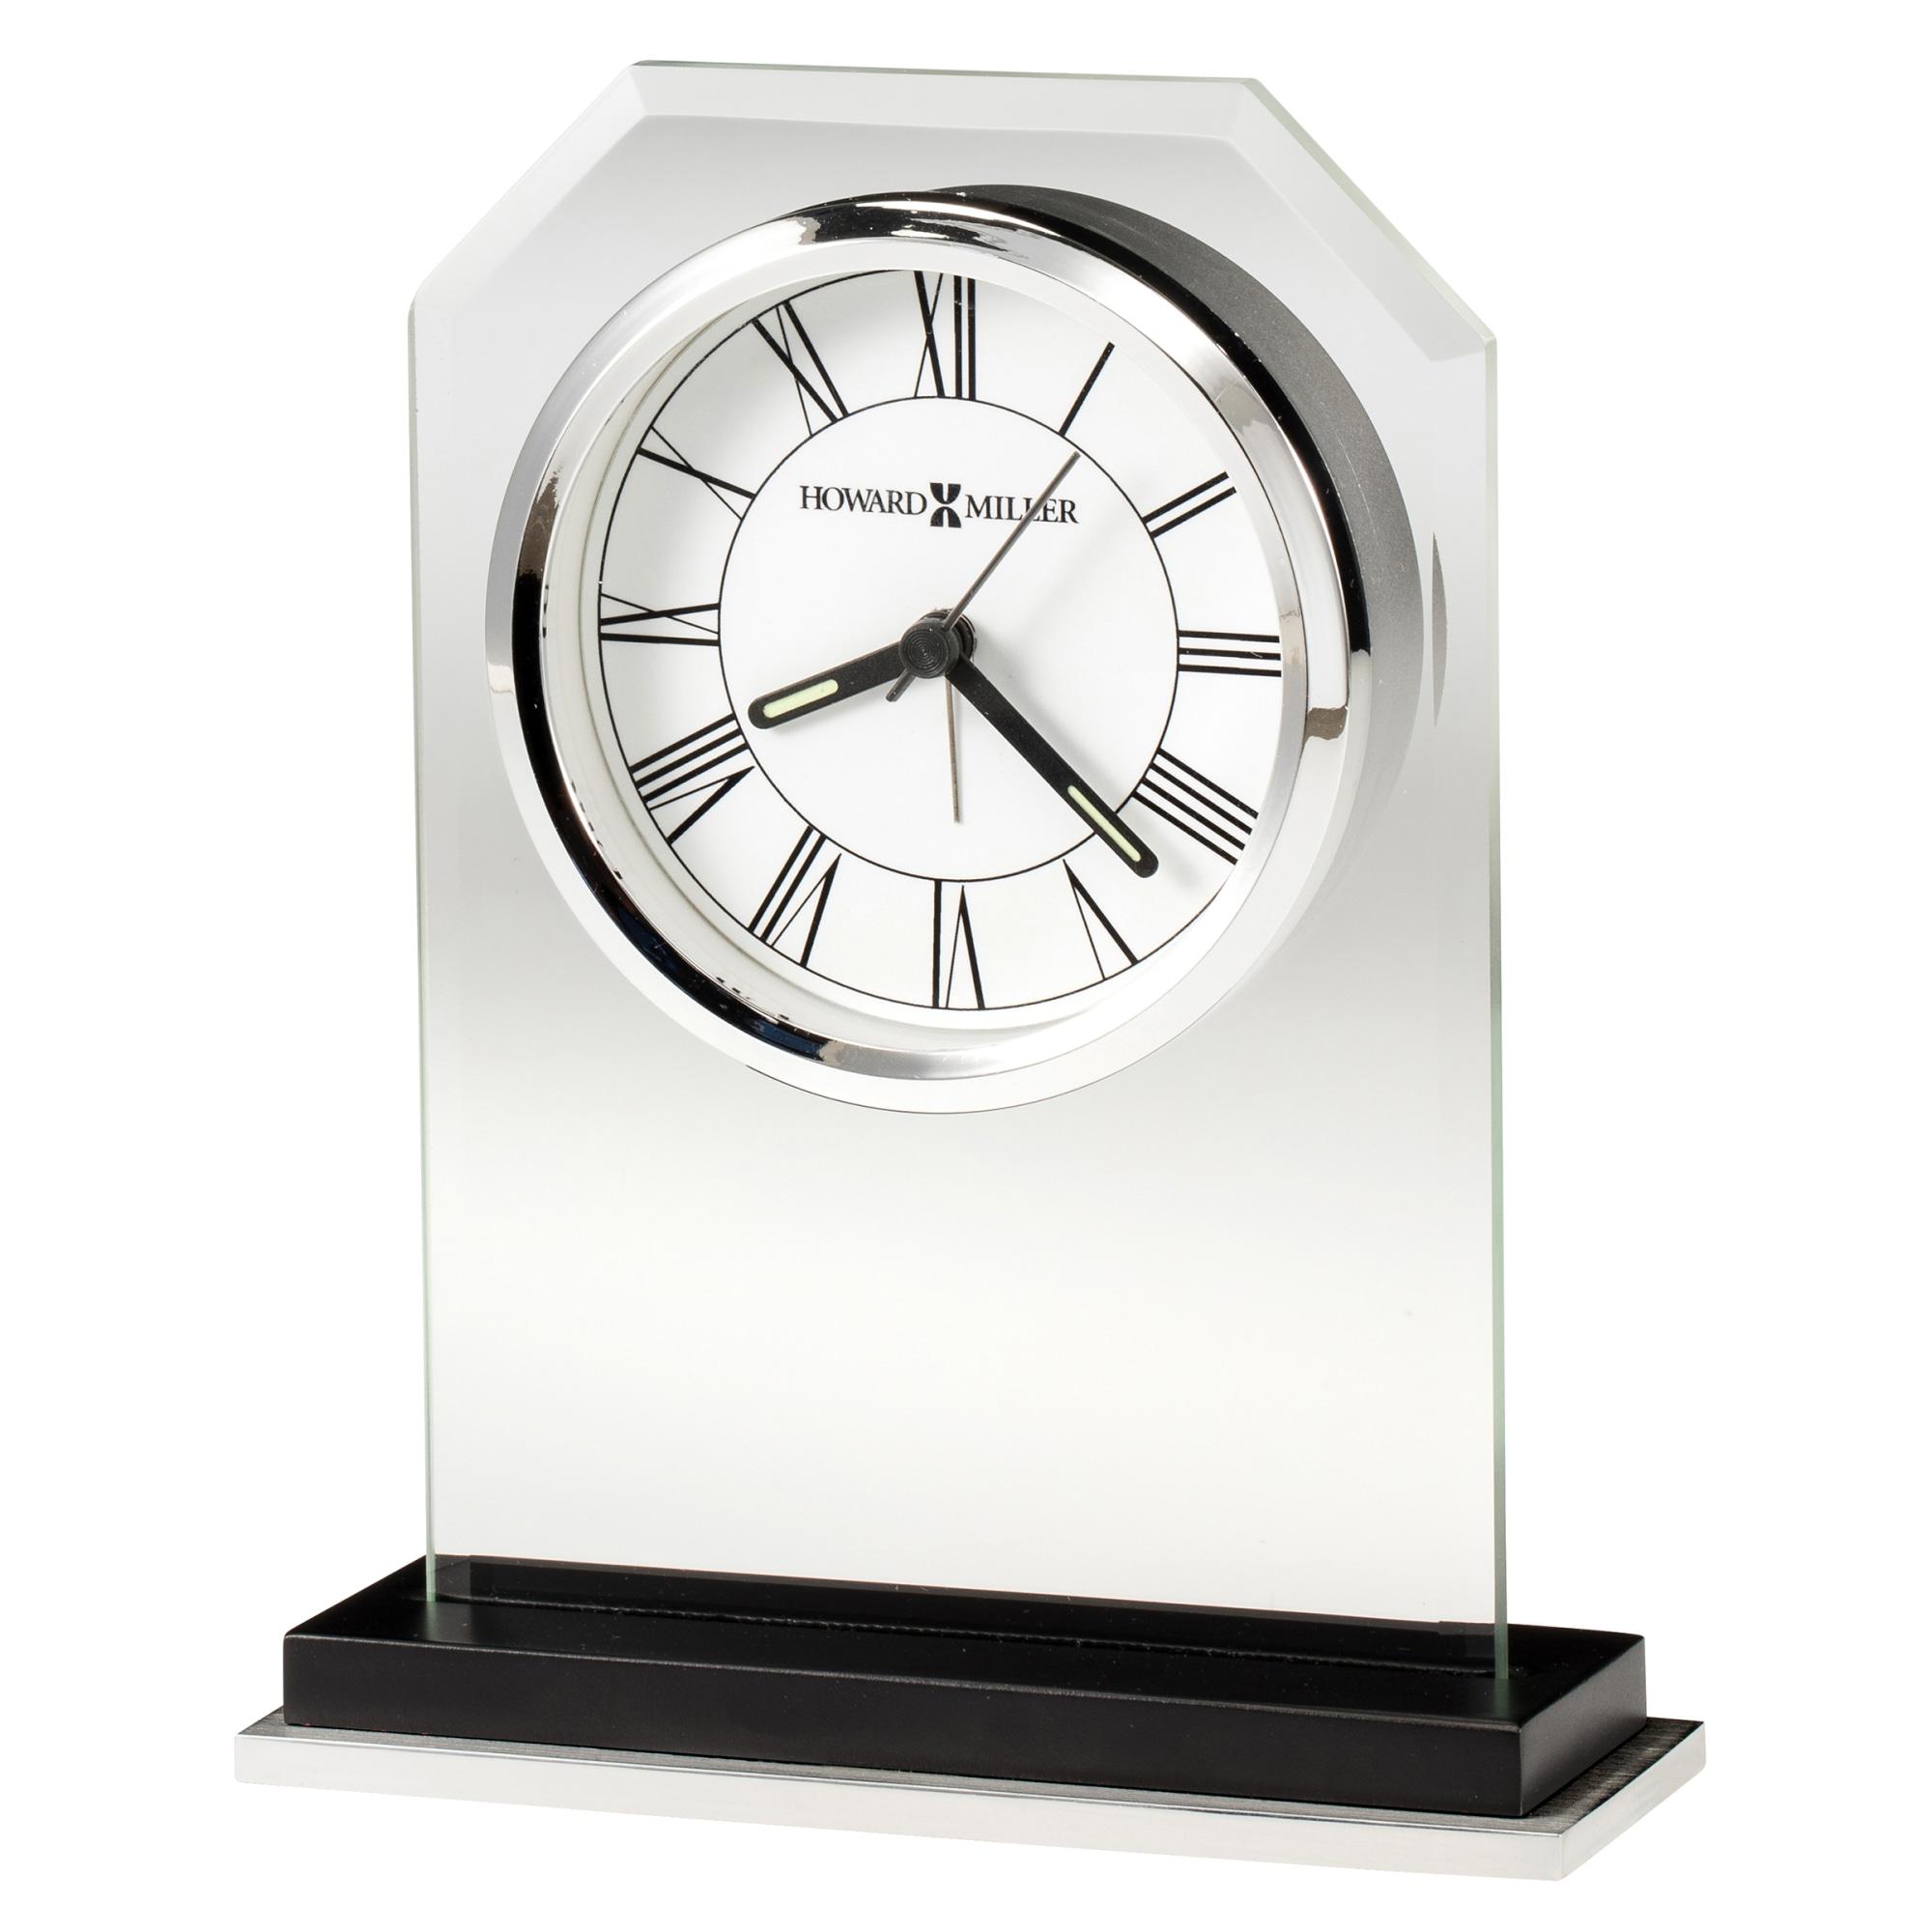 Image for Howard Miller Emerson Table Clock 645785 from Howard Miller Official Website